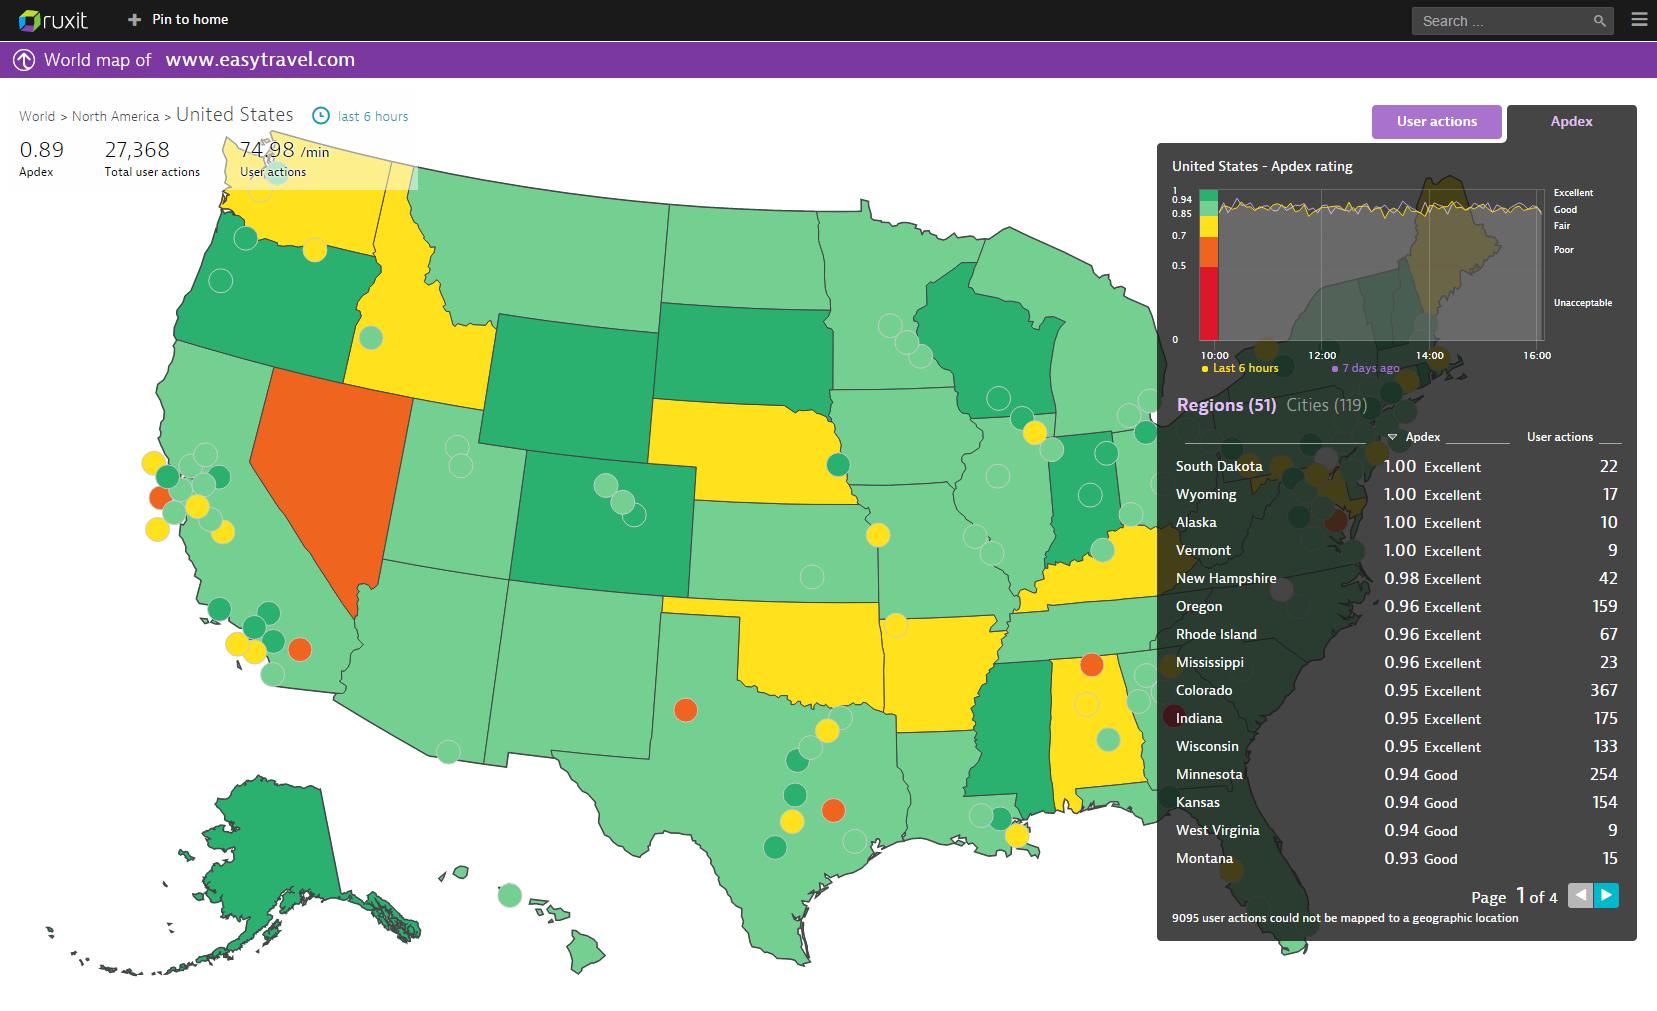 usa-map-regions